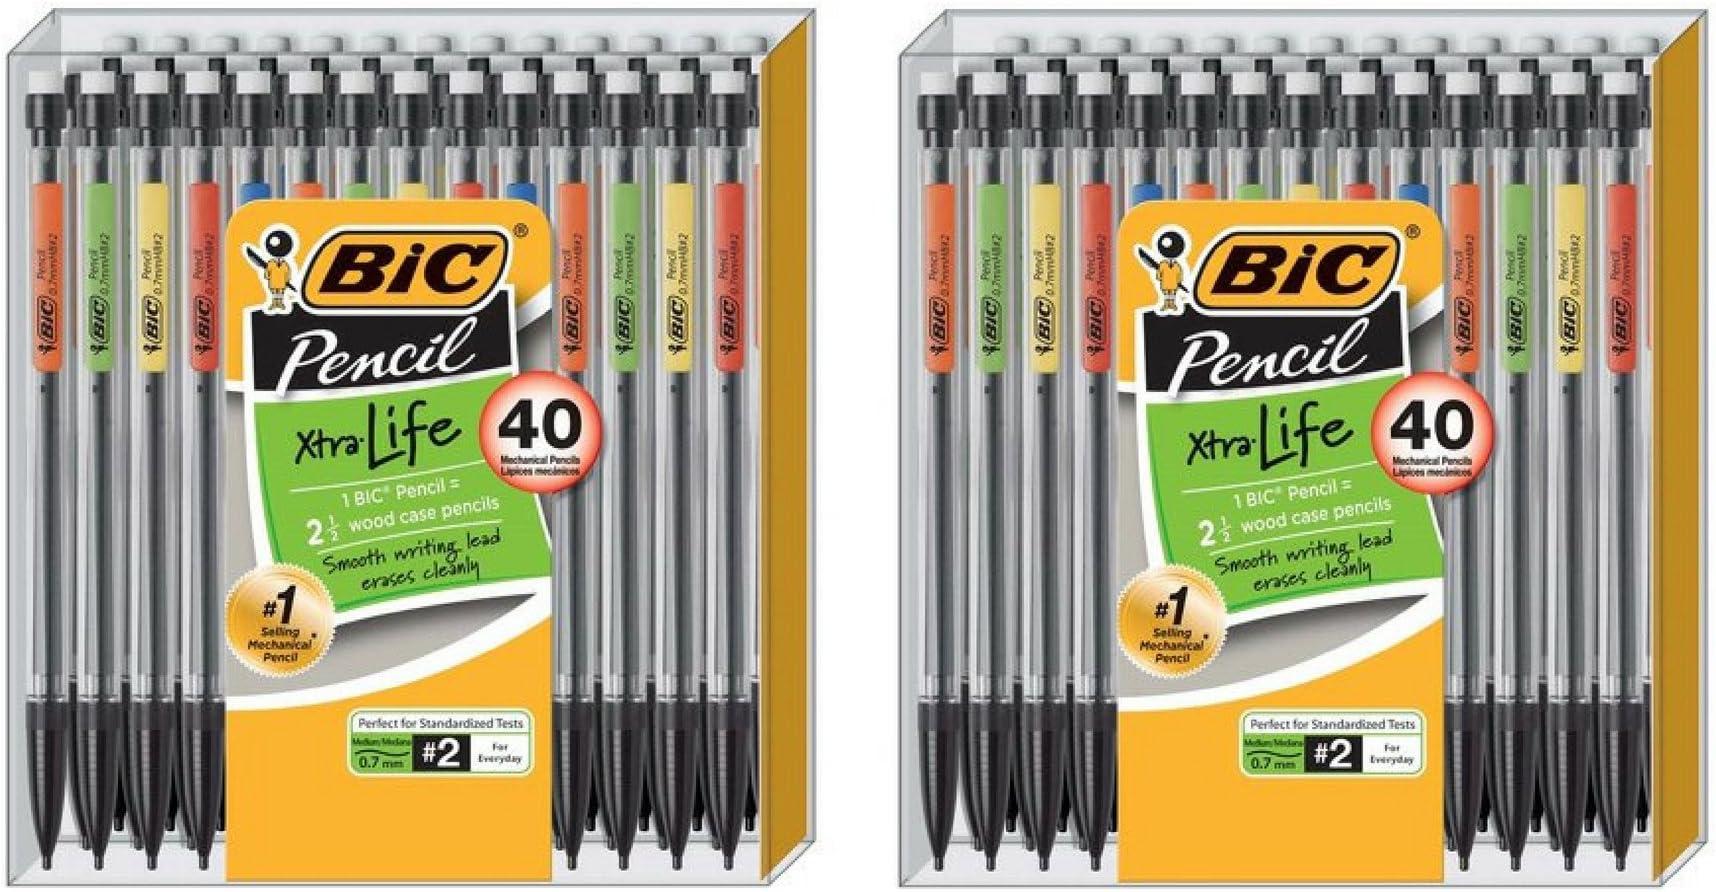 BIC Xtra Life Mechanical Pencil, Medium Point (0.7 mm), 40-Pack - 2 Box